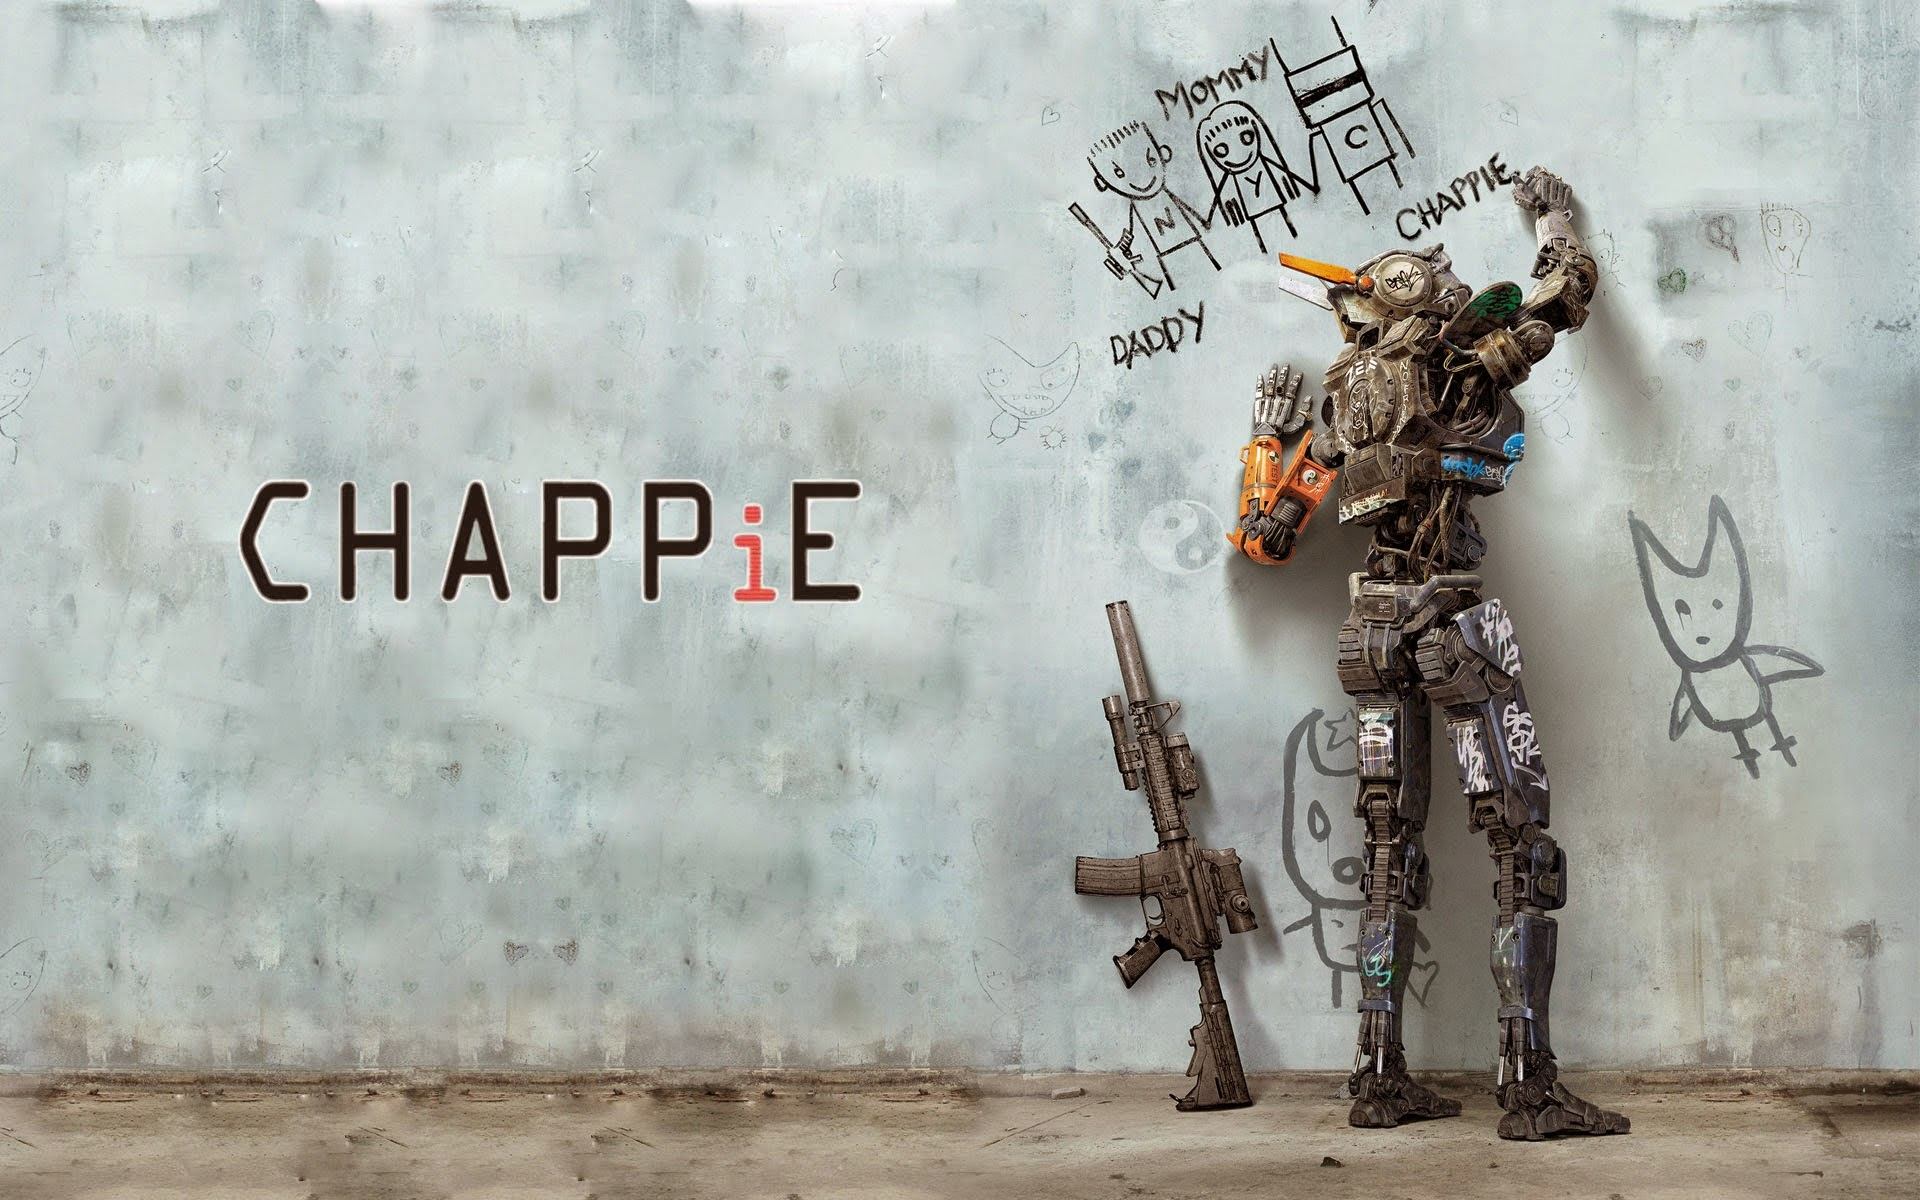 Chappie Wallpaper